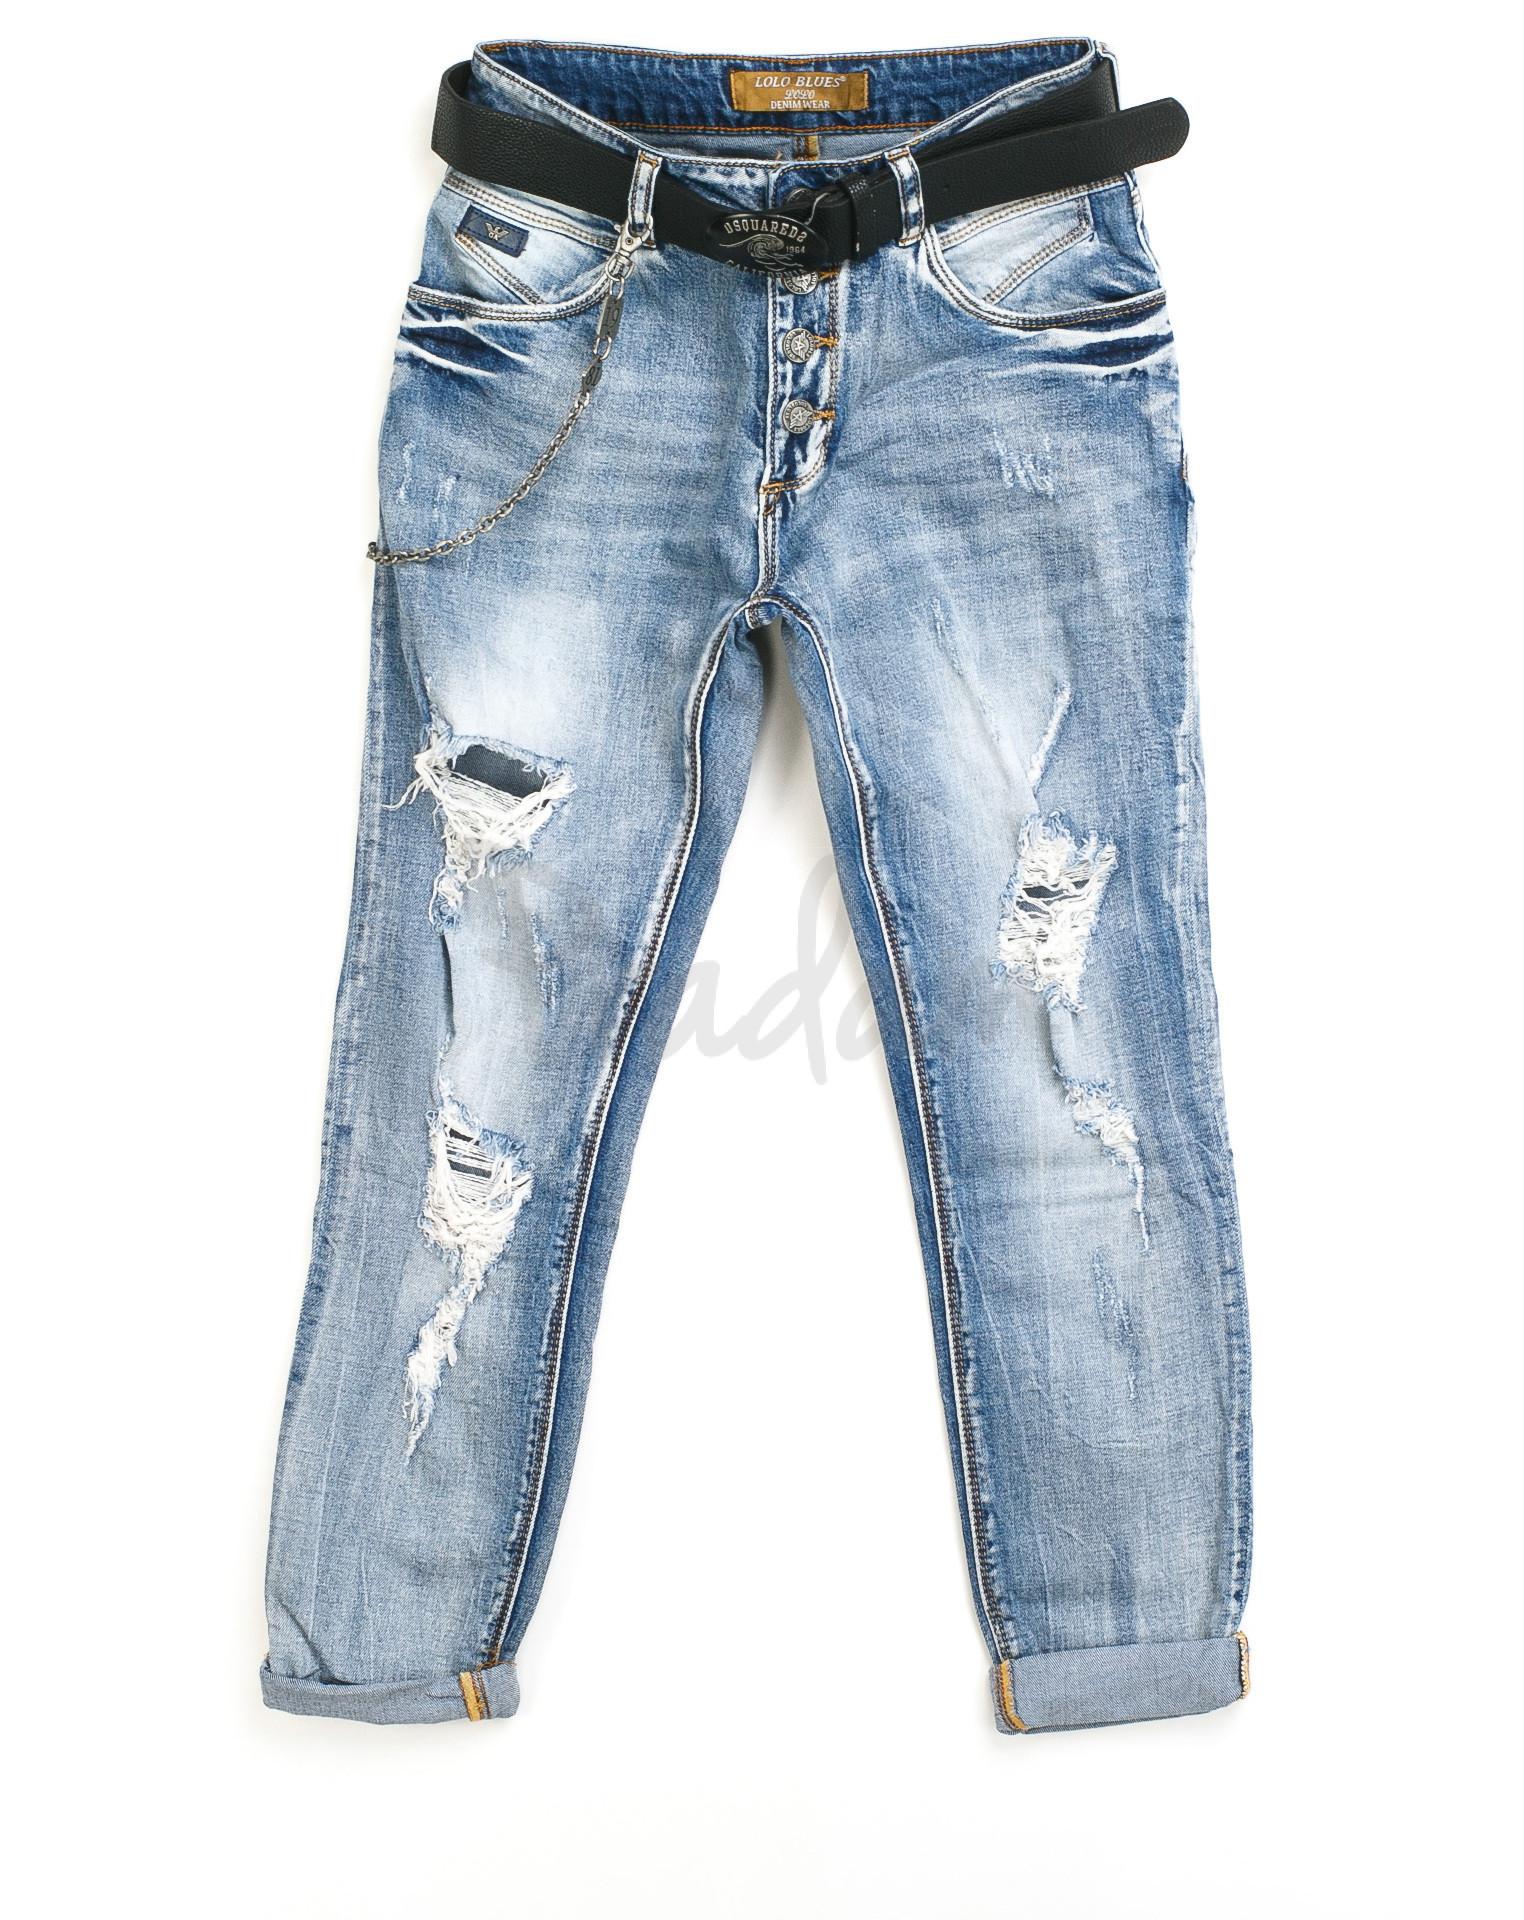 429010c42bf джинсы женские бойфренд на пуговицах 2116 (25-30